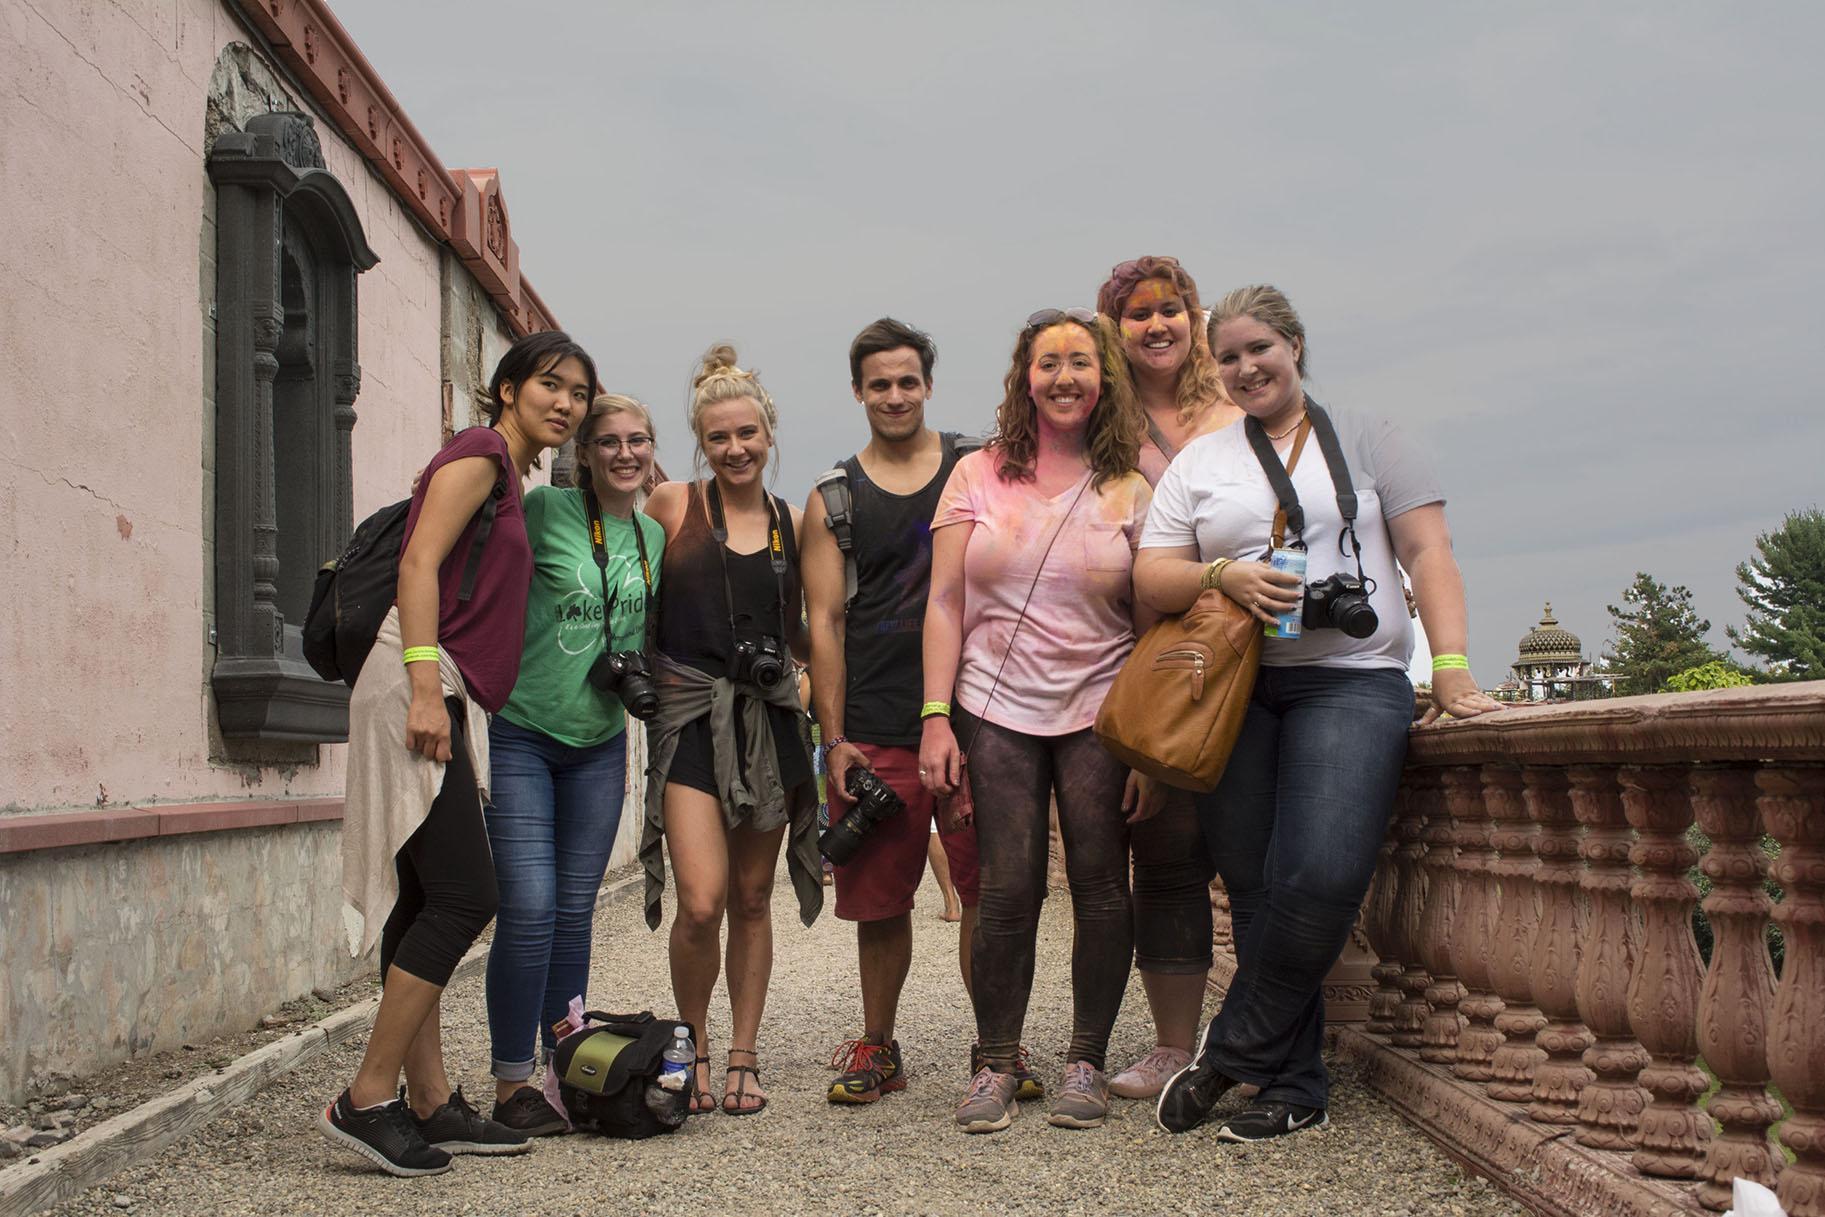 From left to right: Yeshey Tsogyal, Ashley Podrasky, Carley Moynihan, Jeff Annunziata, Naomi Greenstein, Megan Pacileo and Kelsey Mader.